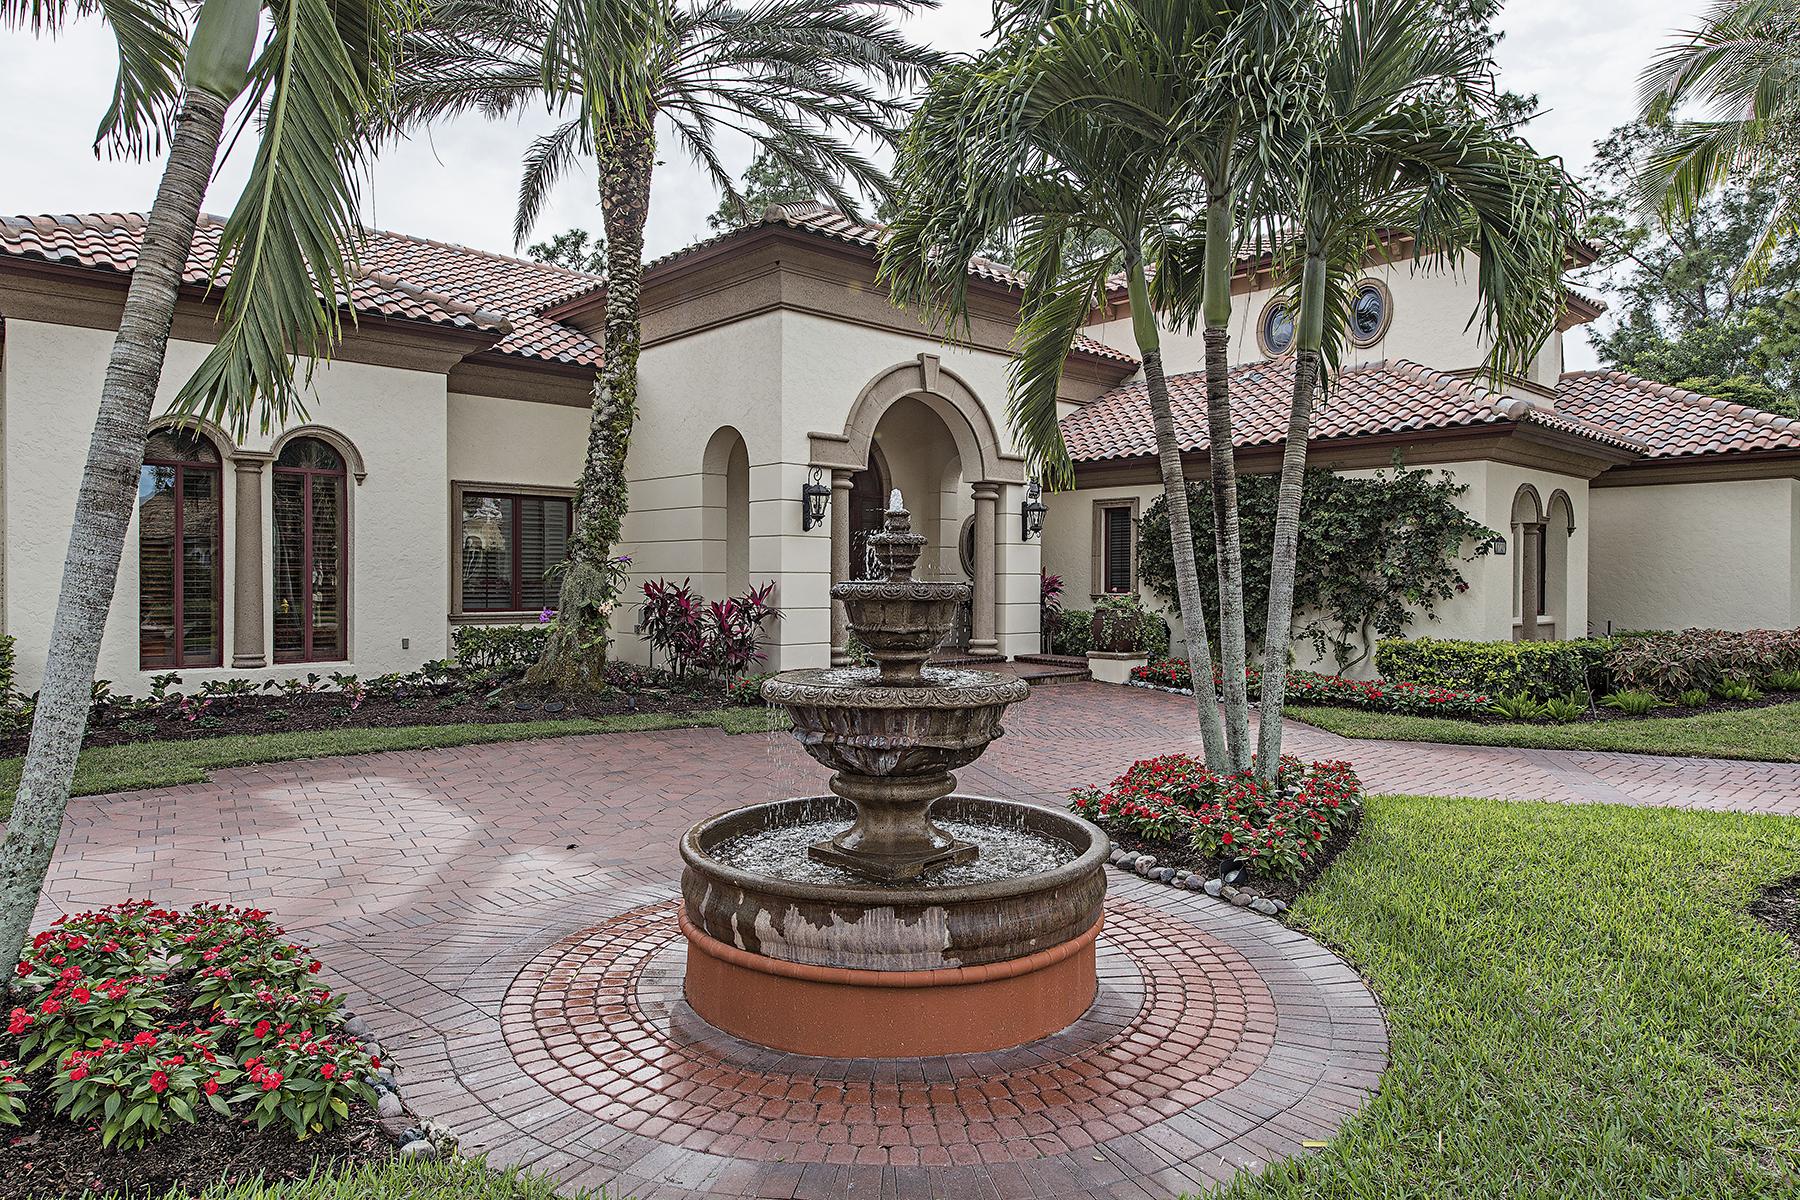 Villa per Vendita alle ore PELICAN MARSH - BAY LAUREL ESTATES 8727 Purslane Dr Naples, Florida, 34109 Stati Uniti